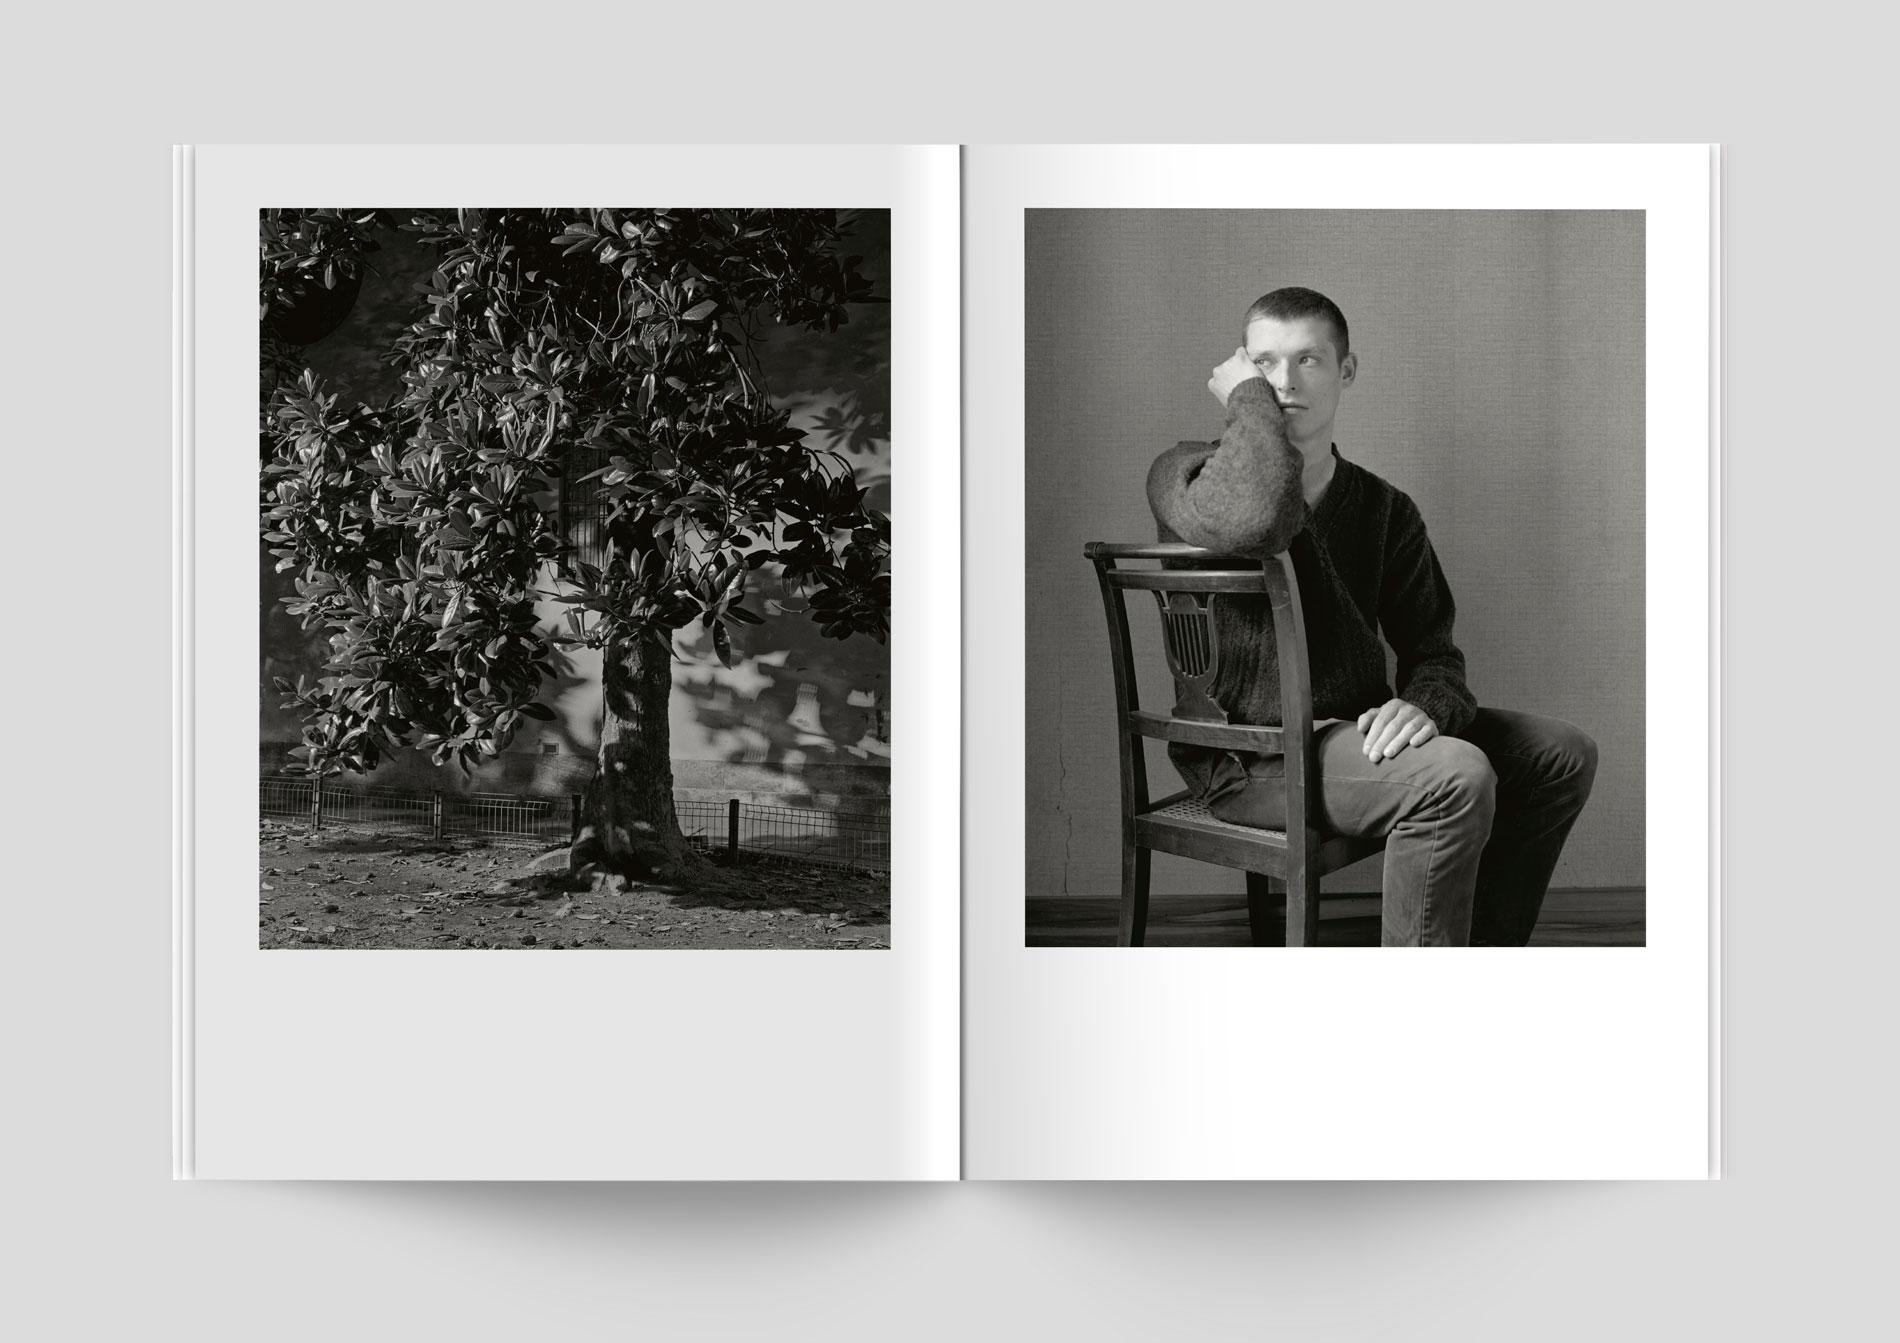 Santoni-Edited-by-Marco-Zanini-Ingar-Krauss-01